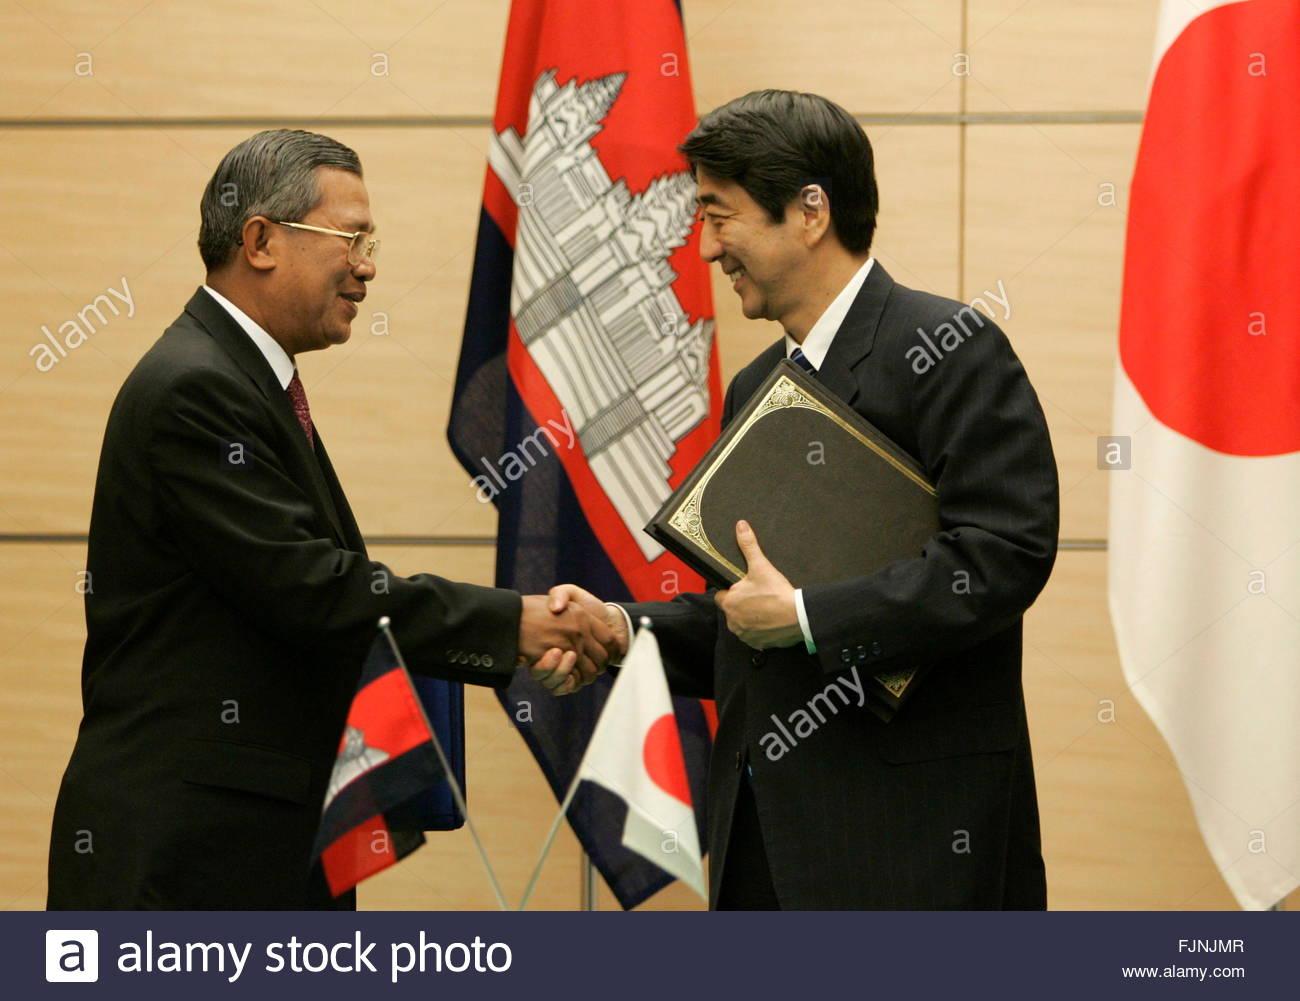 Image result for prime minister hun sen with Japan's Abe